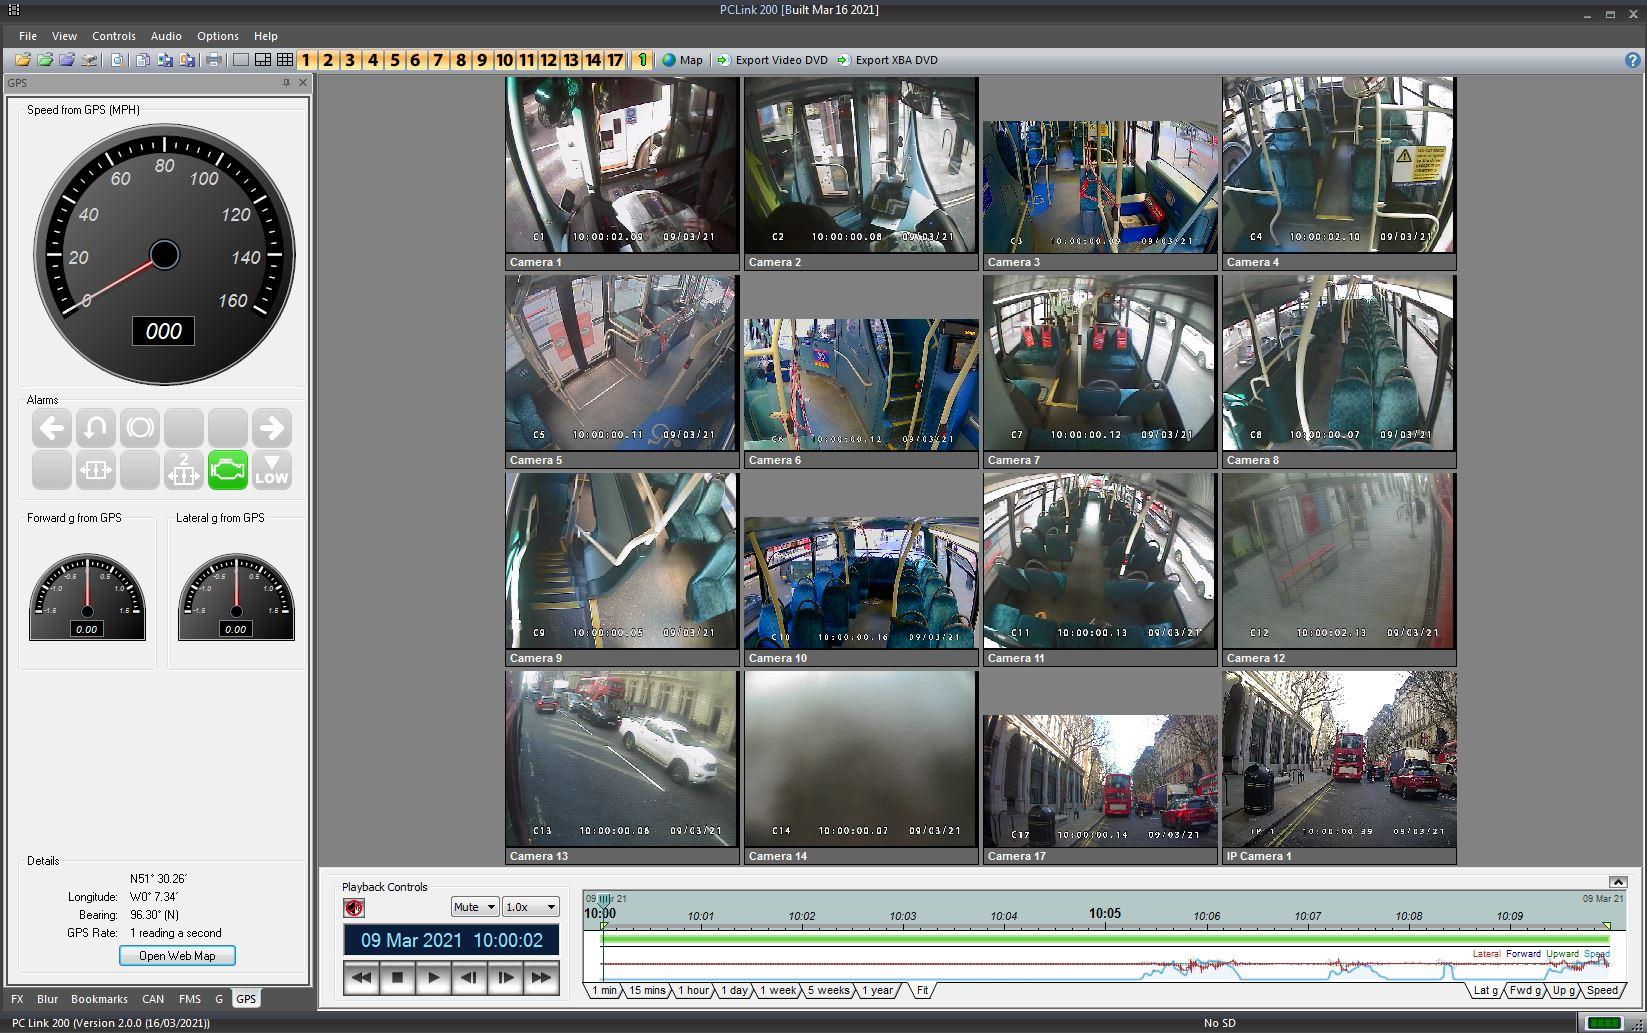 Portable Covert Surveillance Systems Mobile Cctv